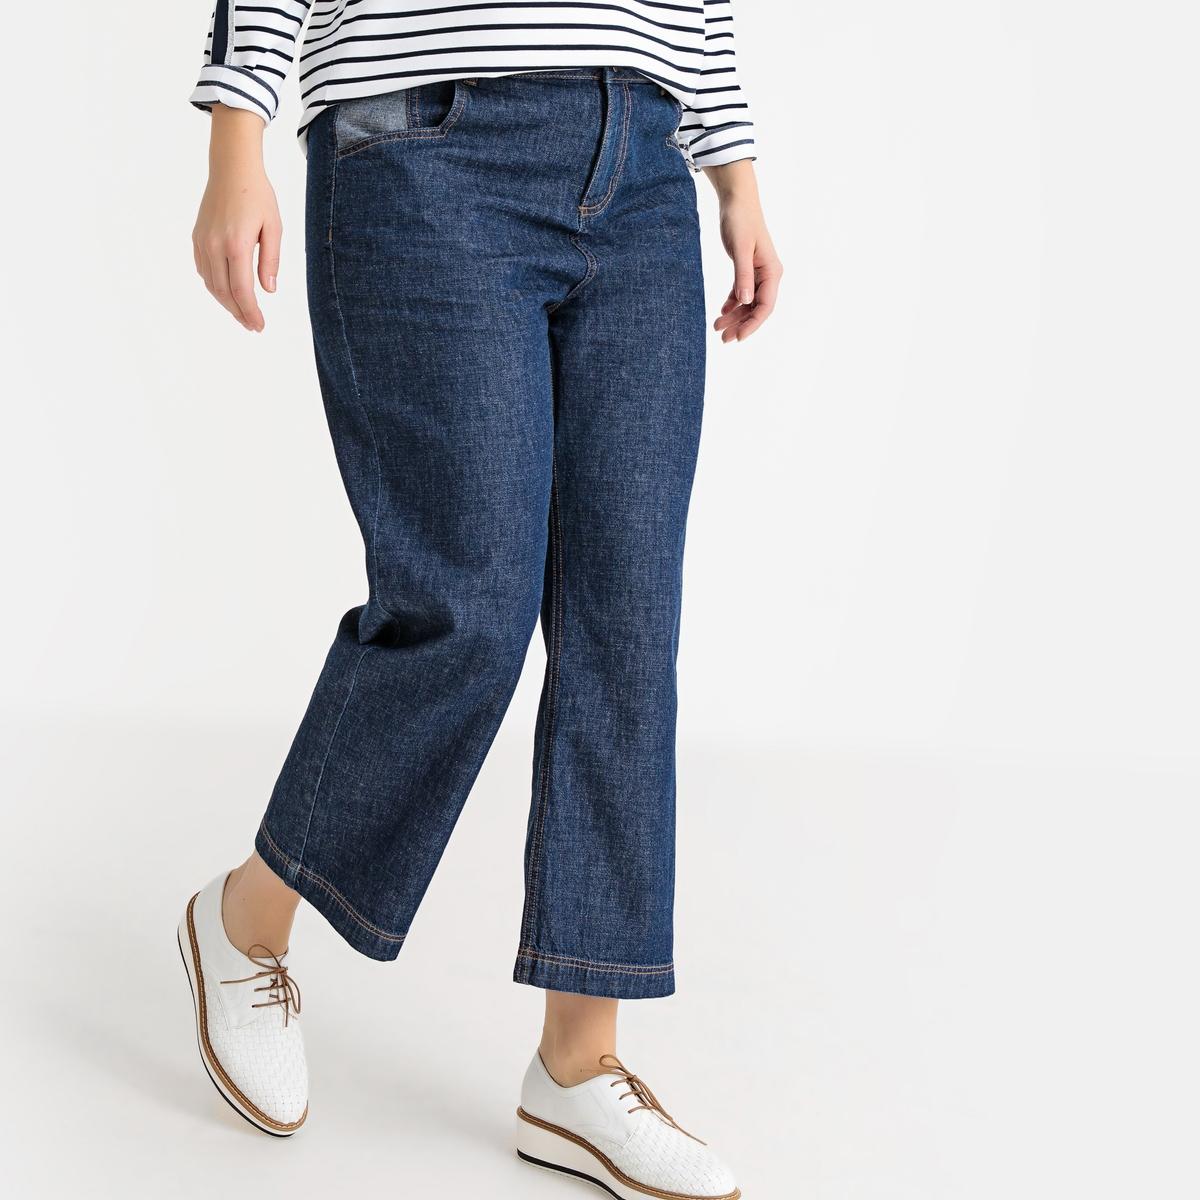 Jeans largos, curtos em ganga brut